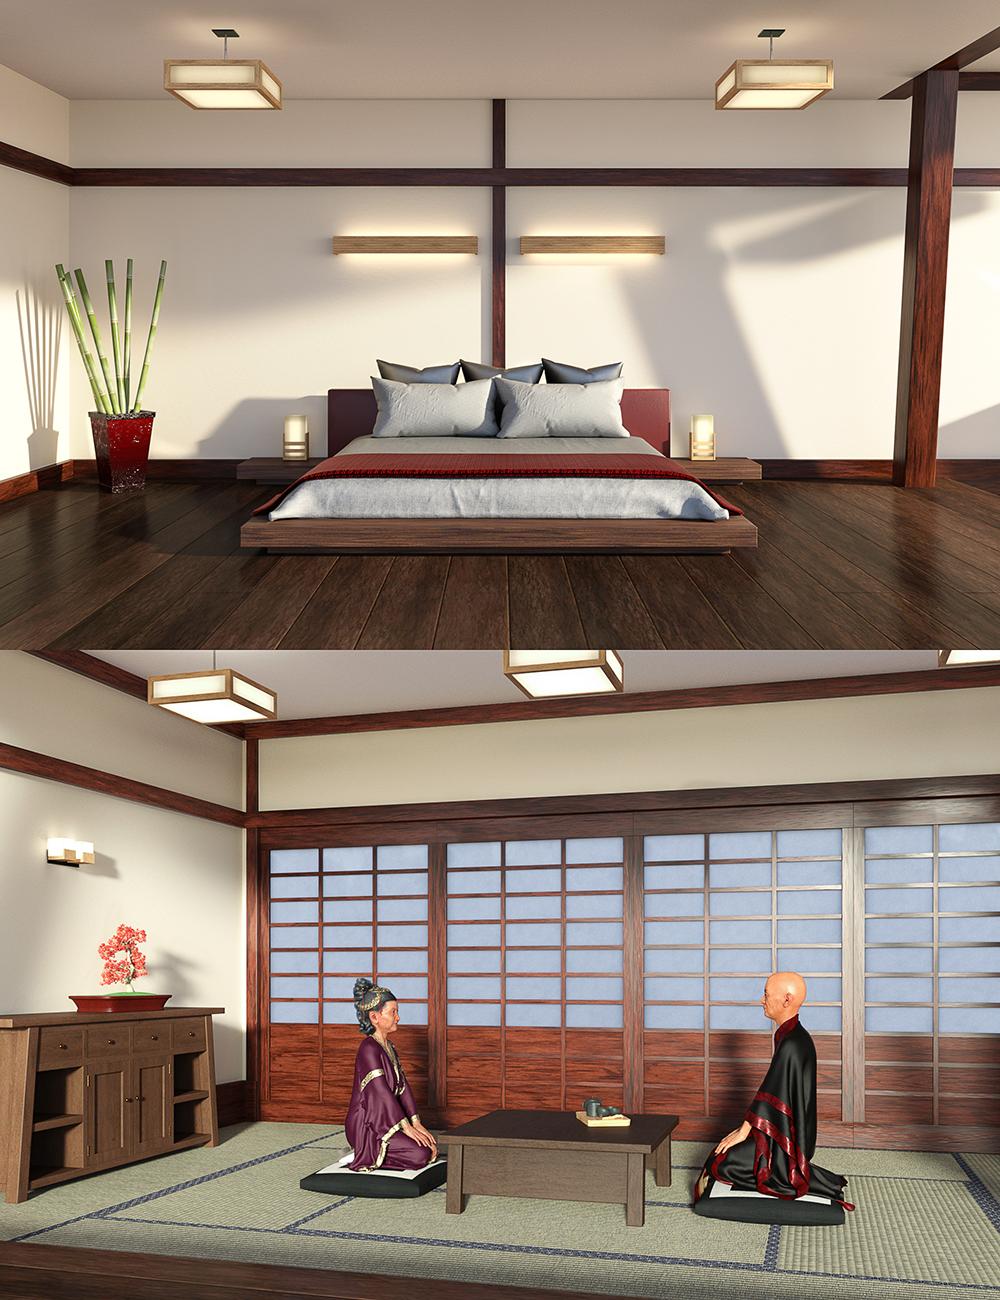 DD Japanese Bedroom by: Digital Delirium, 3D Models by Daz 3D